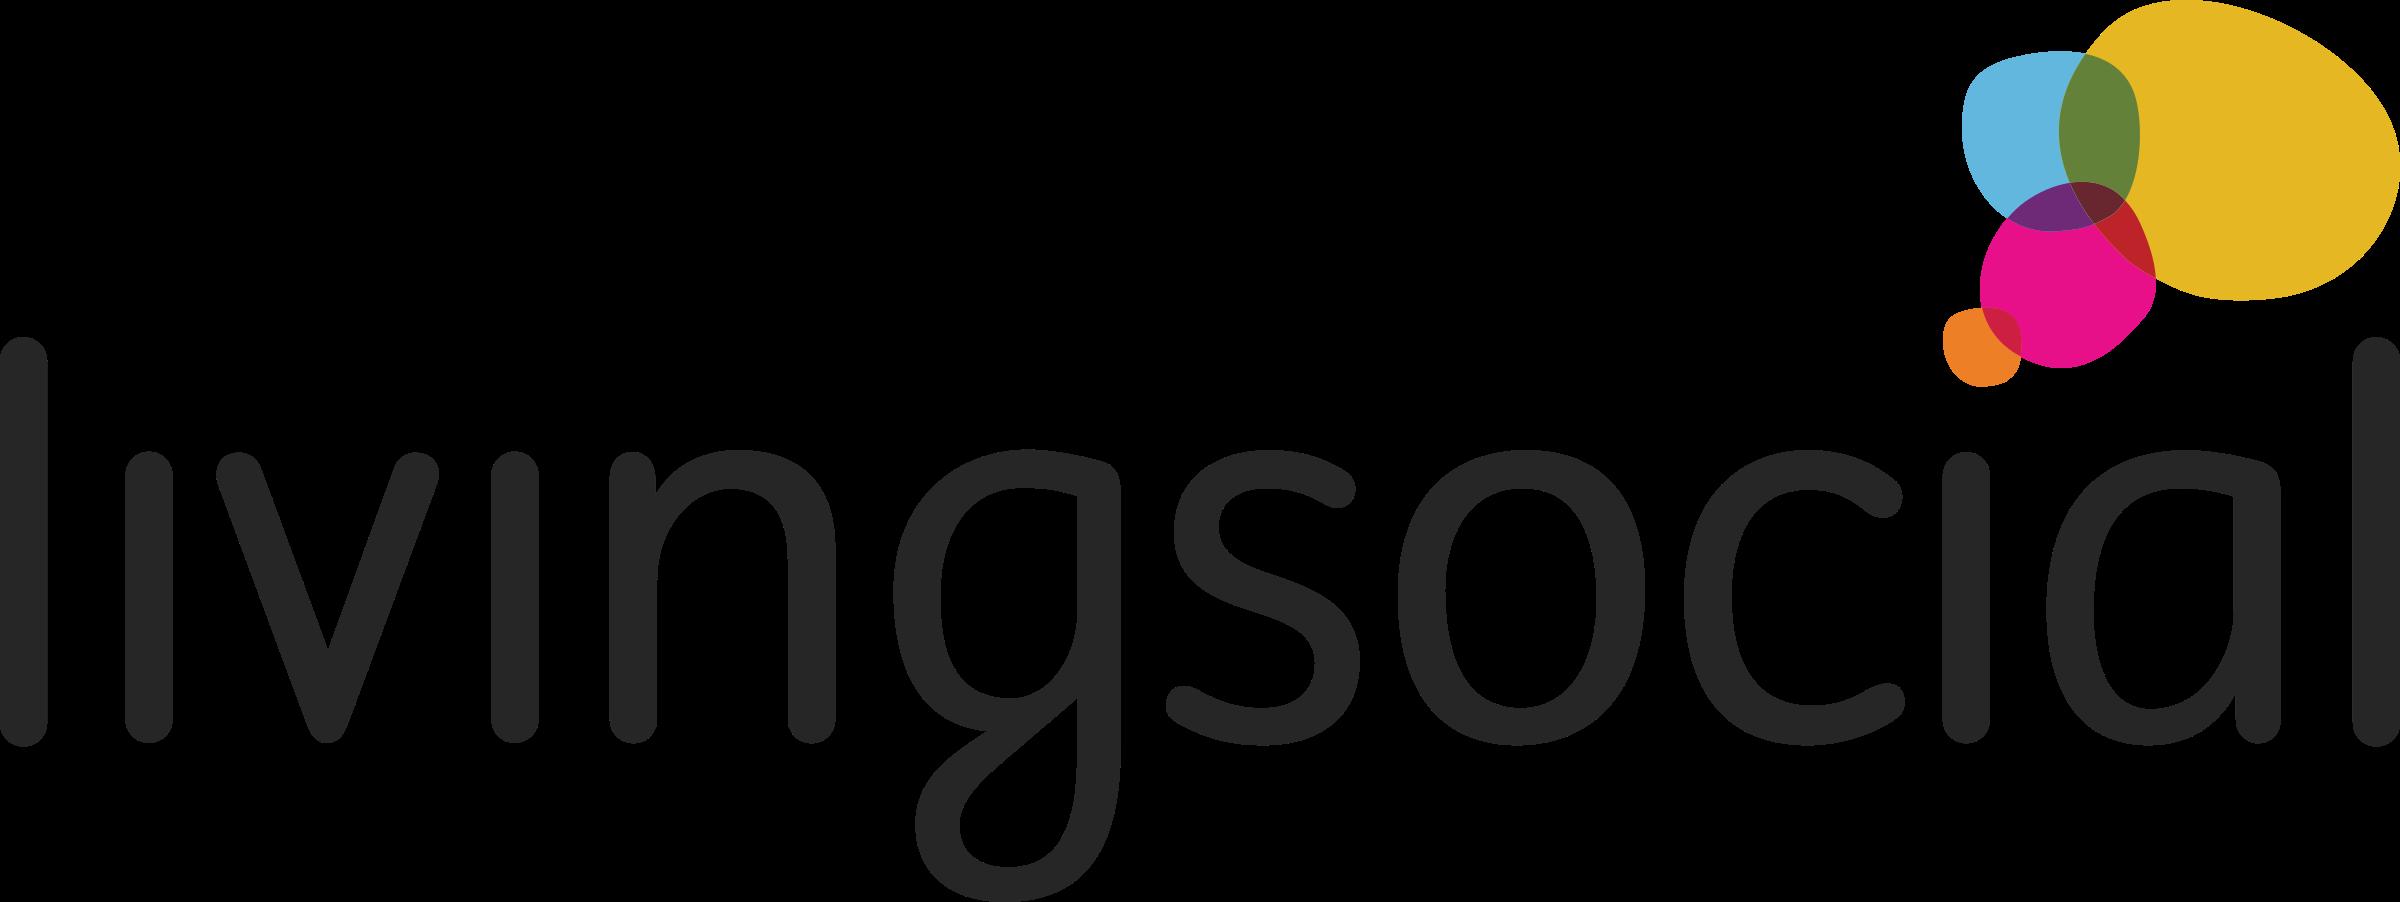 LivingSocial Logo PNG Transparent & SVG Vector.